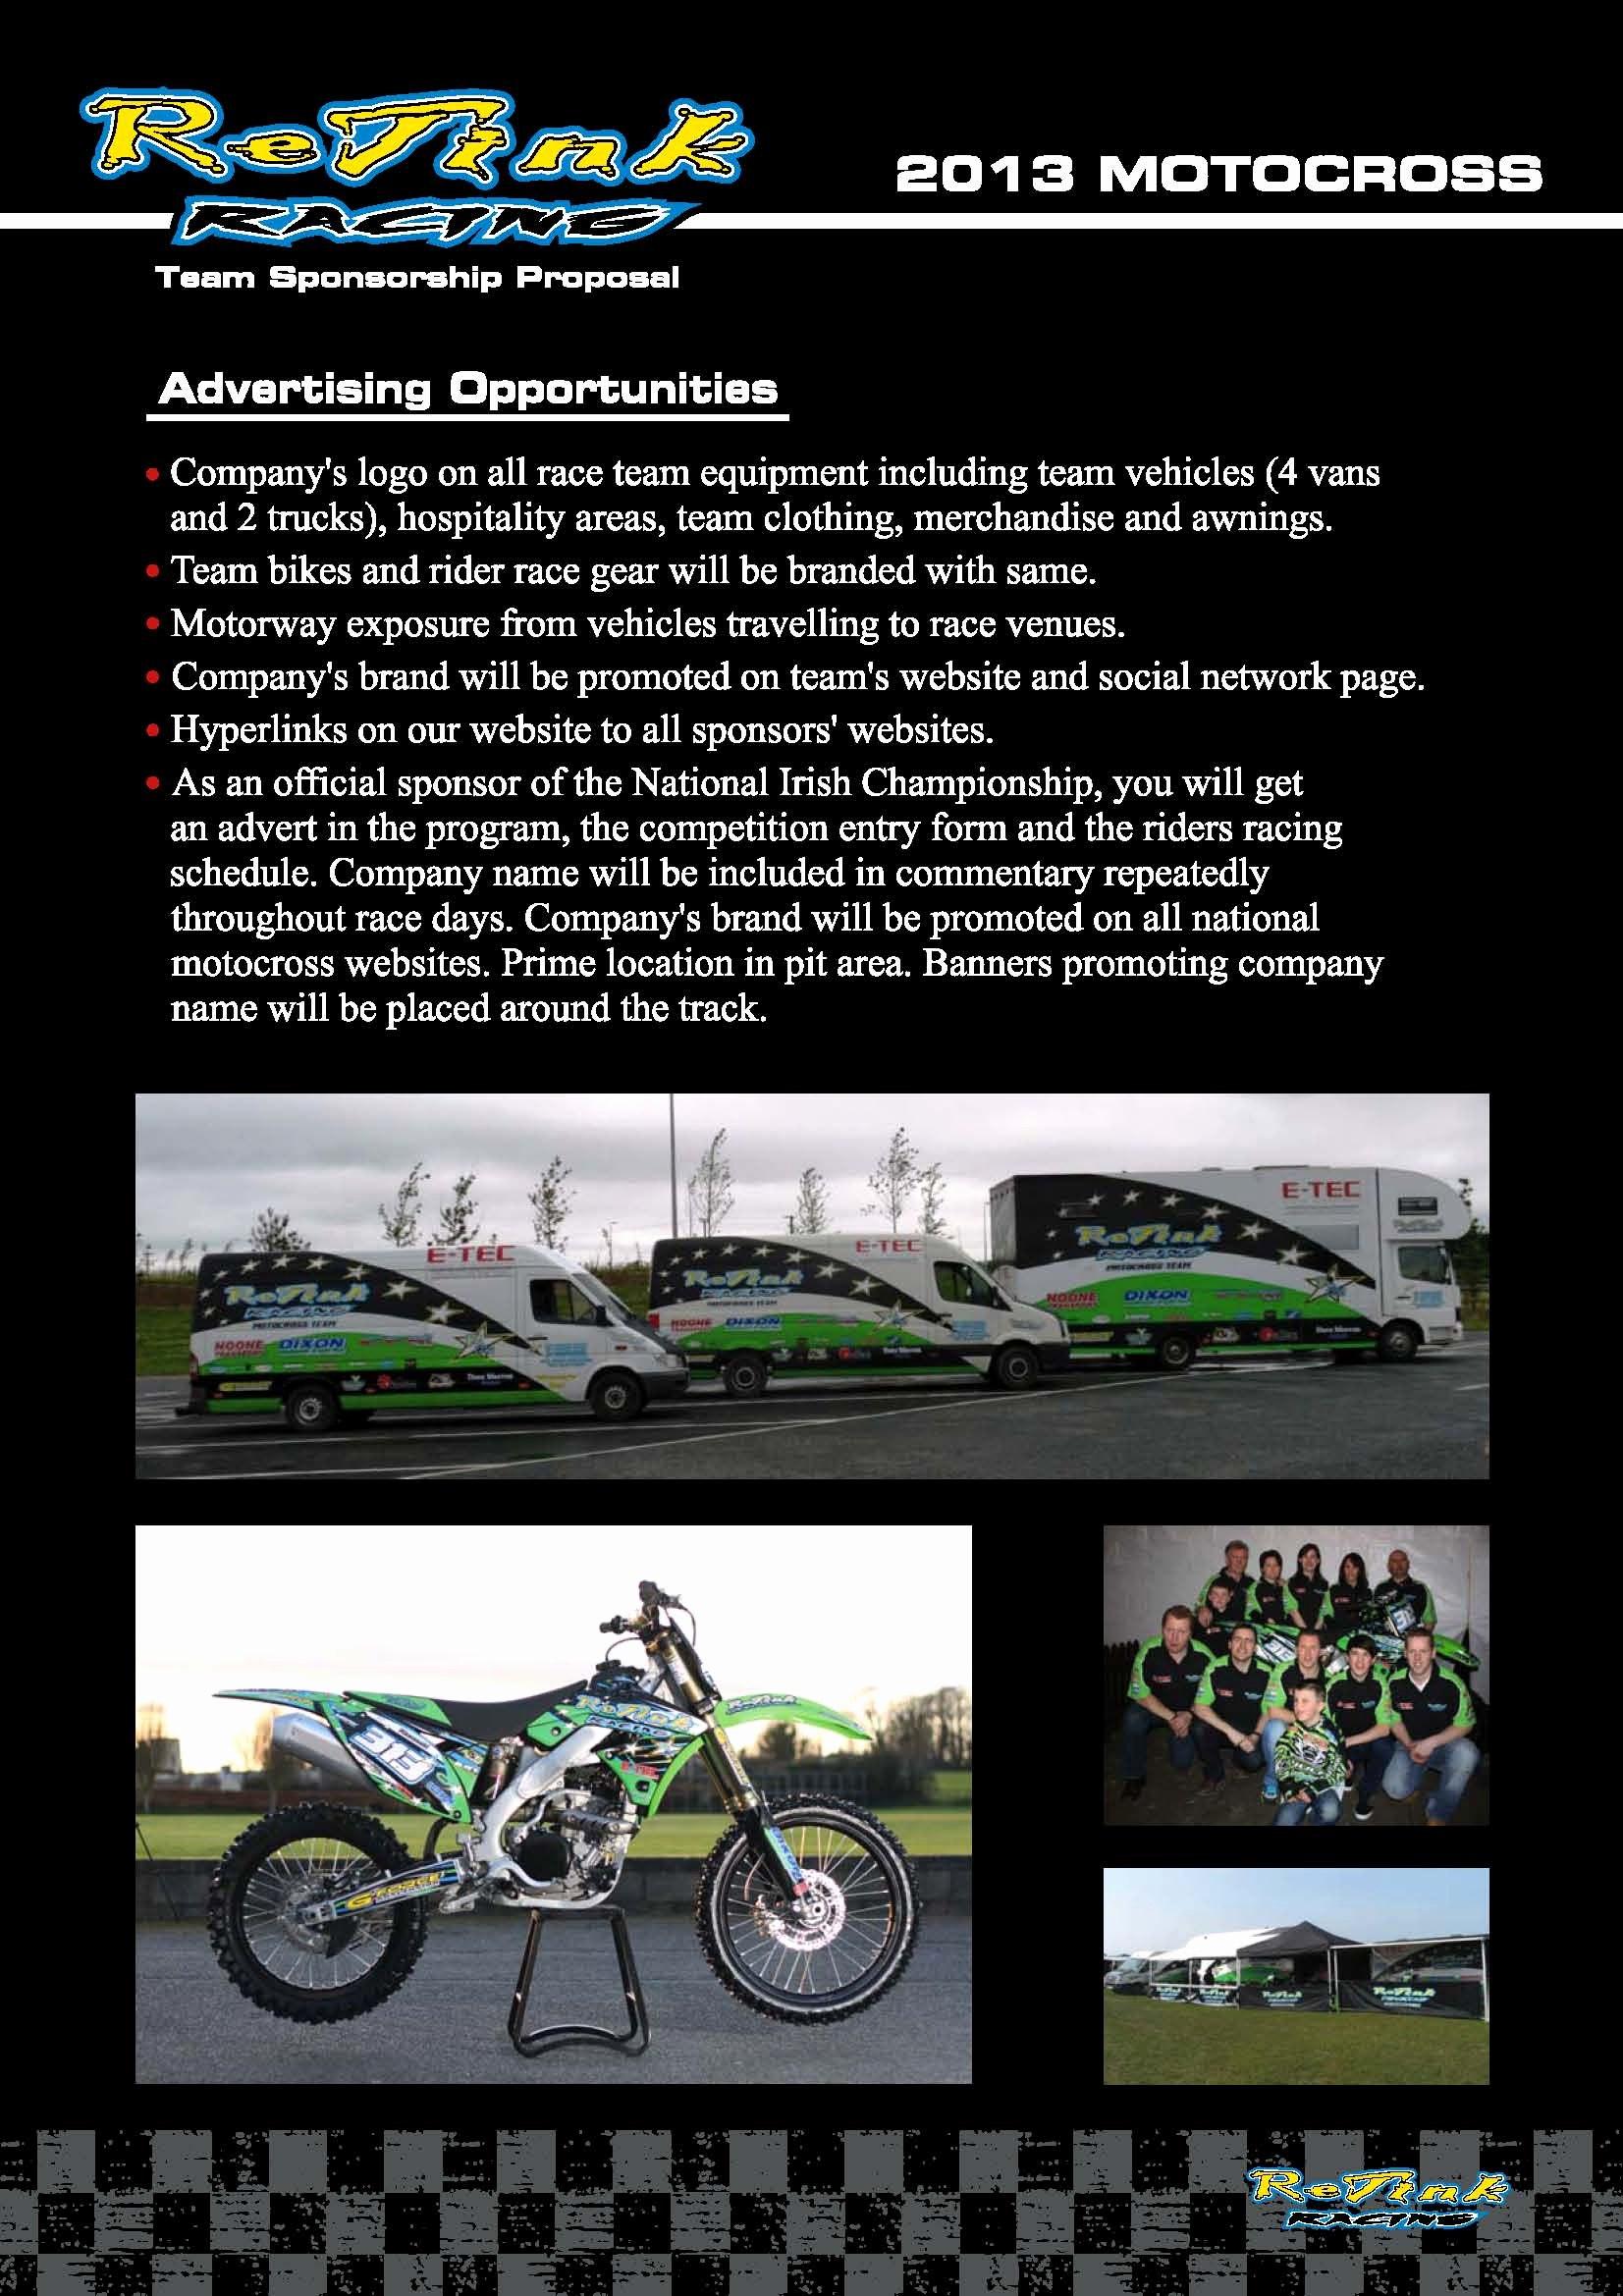 Car Racing Sponsorship Contract Template Homeworktidy X – Example Throughout Racing Sponsorship Proposal Template